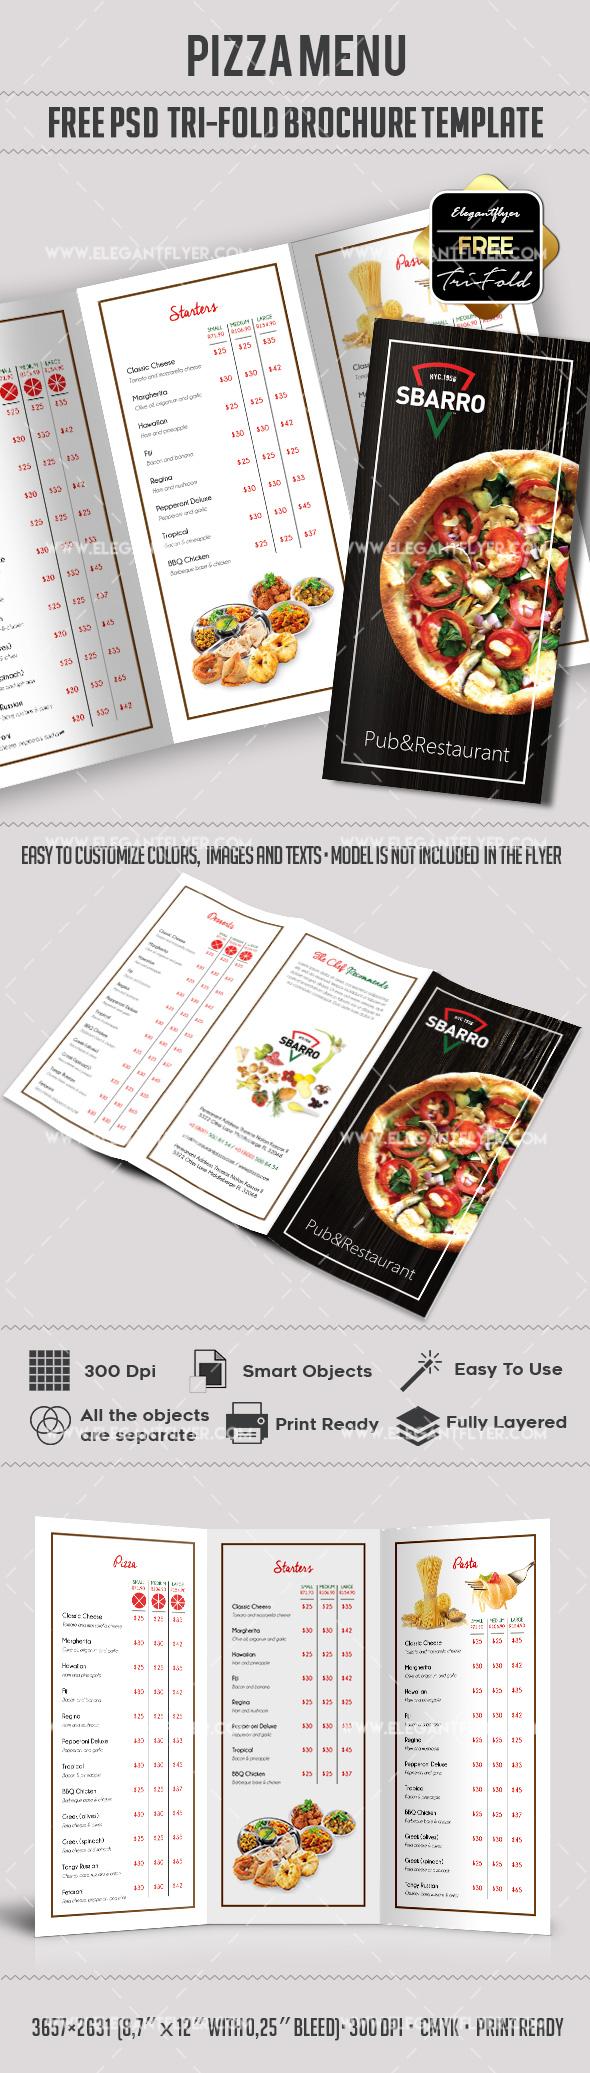 Großartig Pizza Menü Vorlage Wort Galerie - Entry Level Resume ...